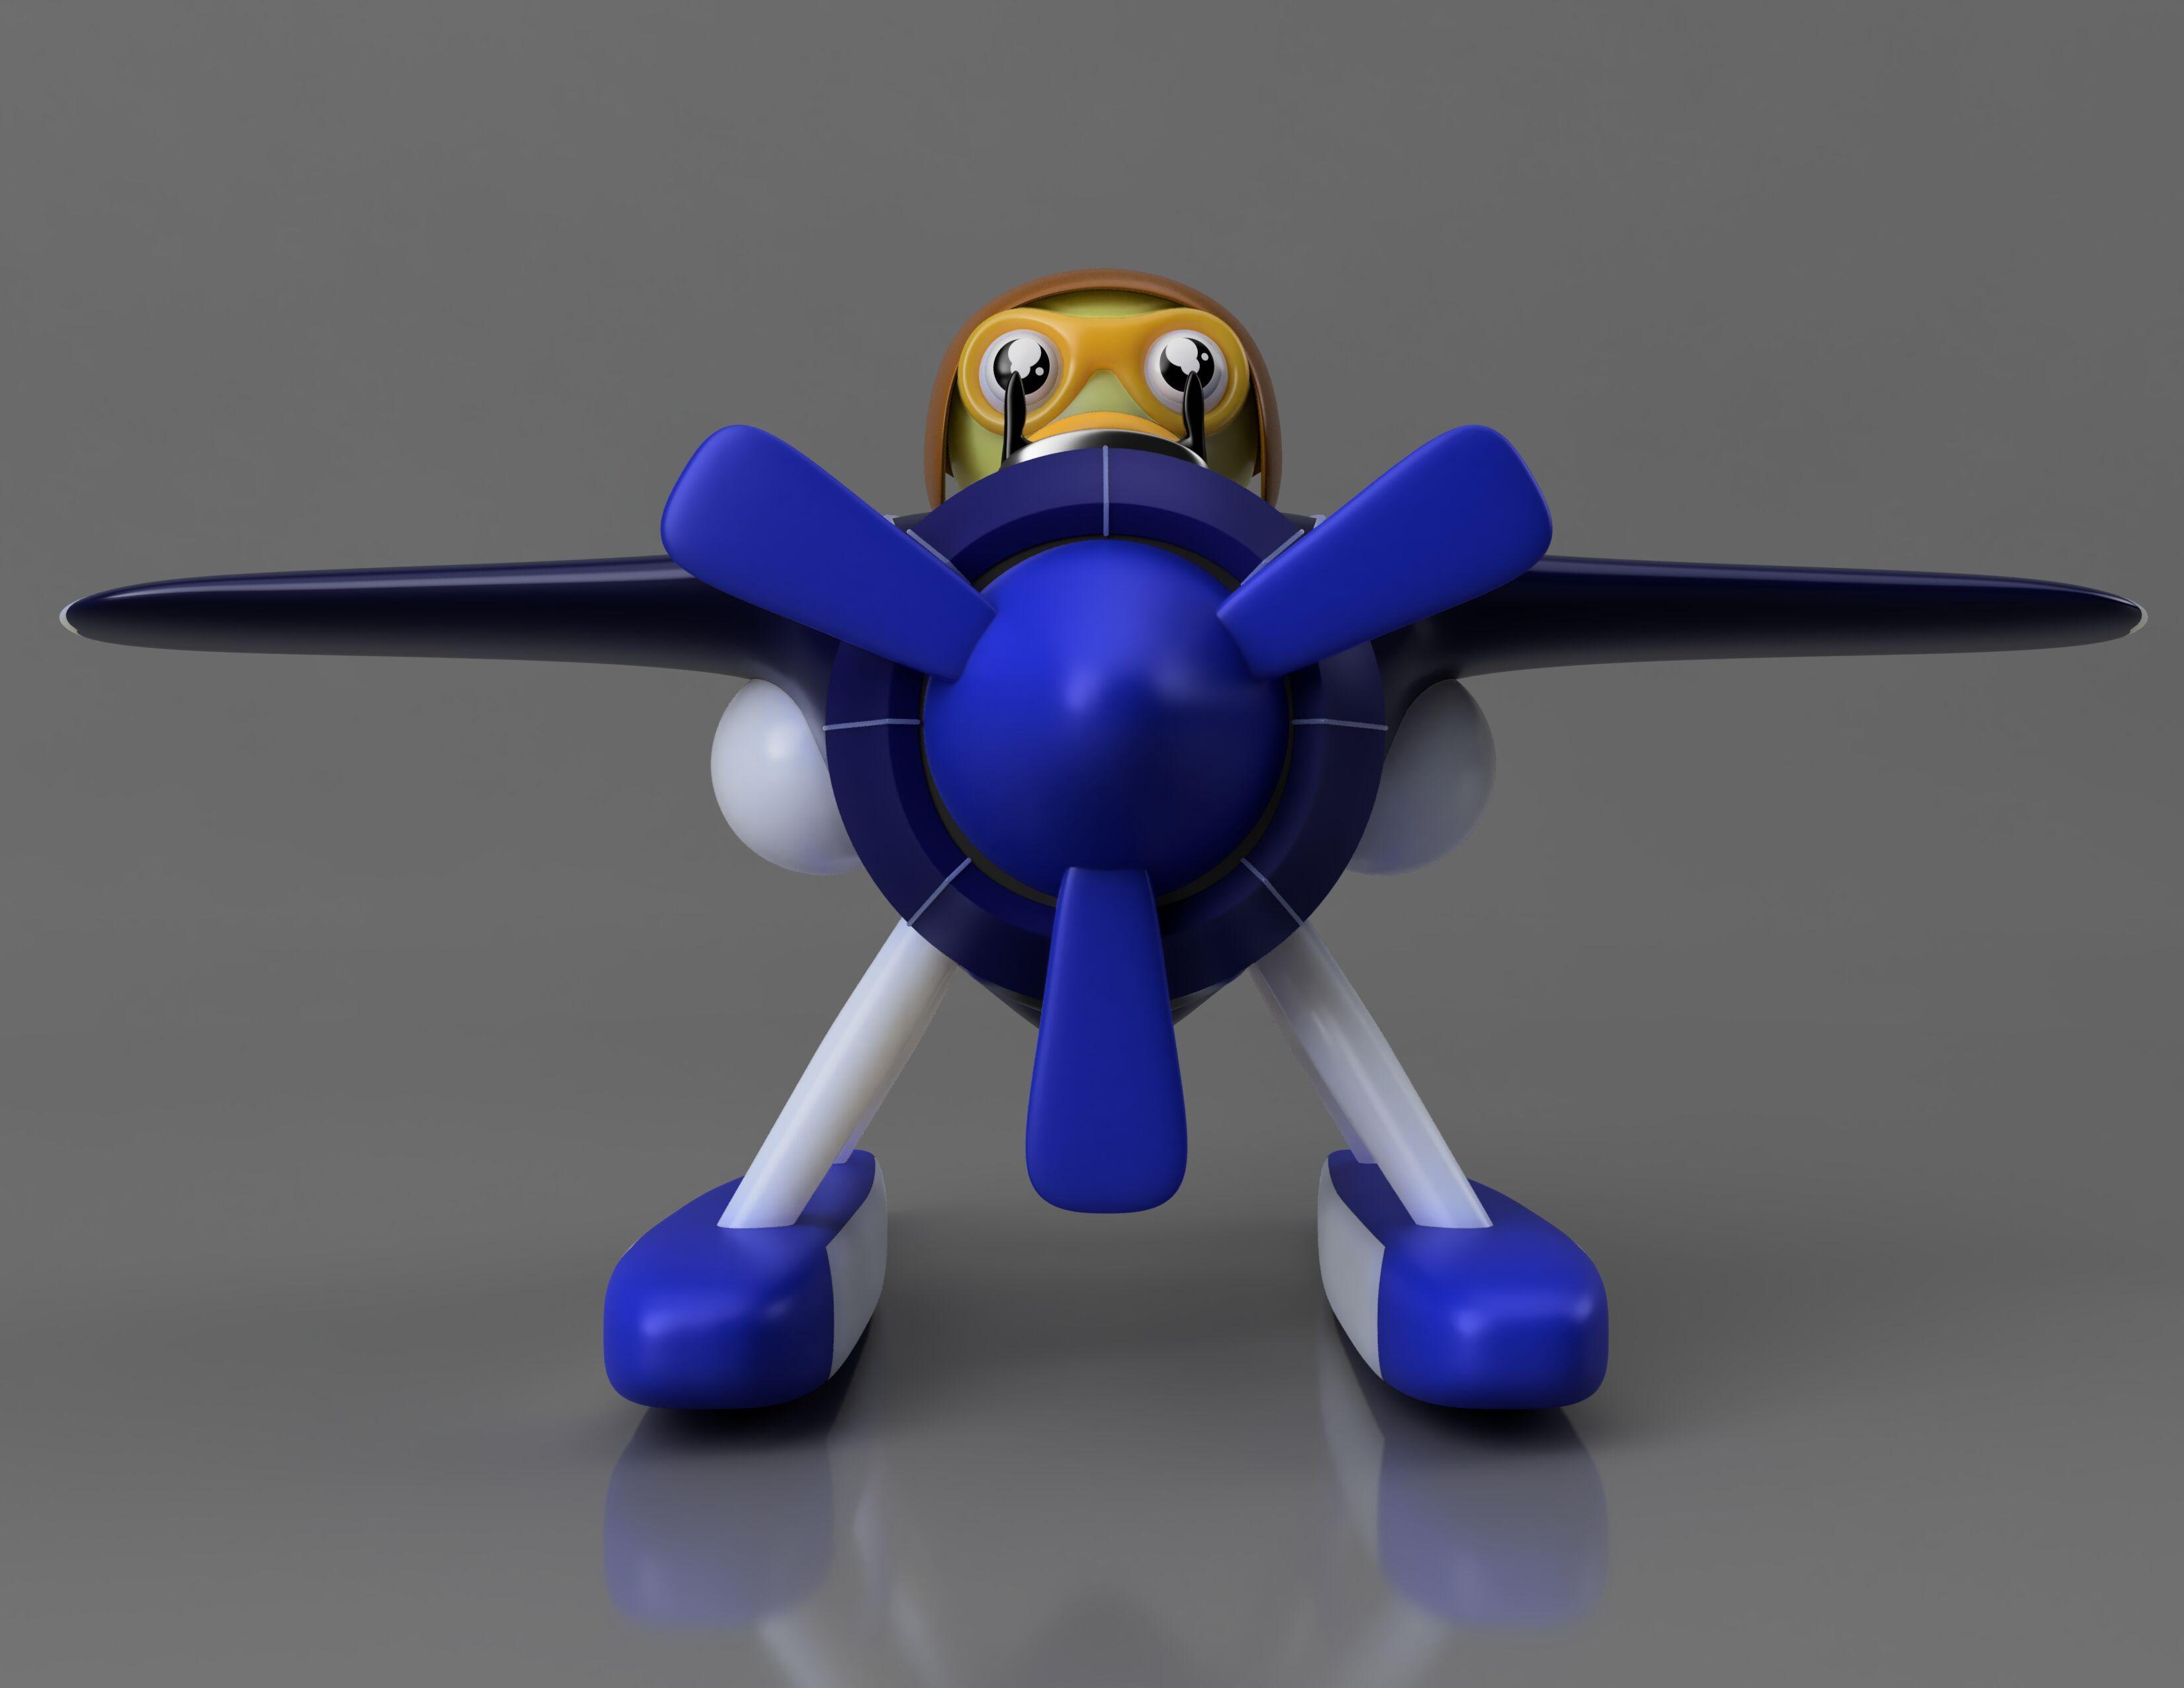 Avion-de-juguete--render-2020-jun-29-09-17-17pm-000-customizedview221528762-png-3500-3500